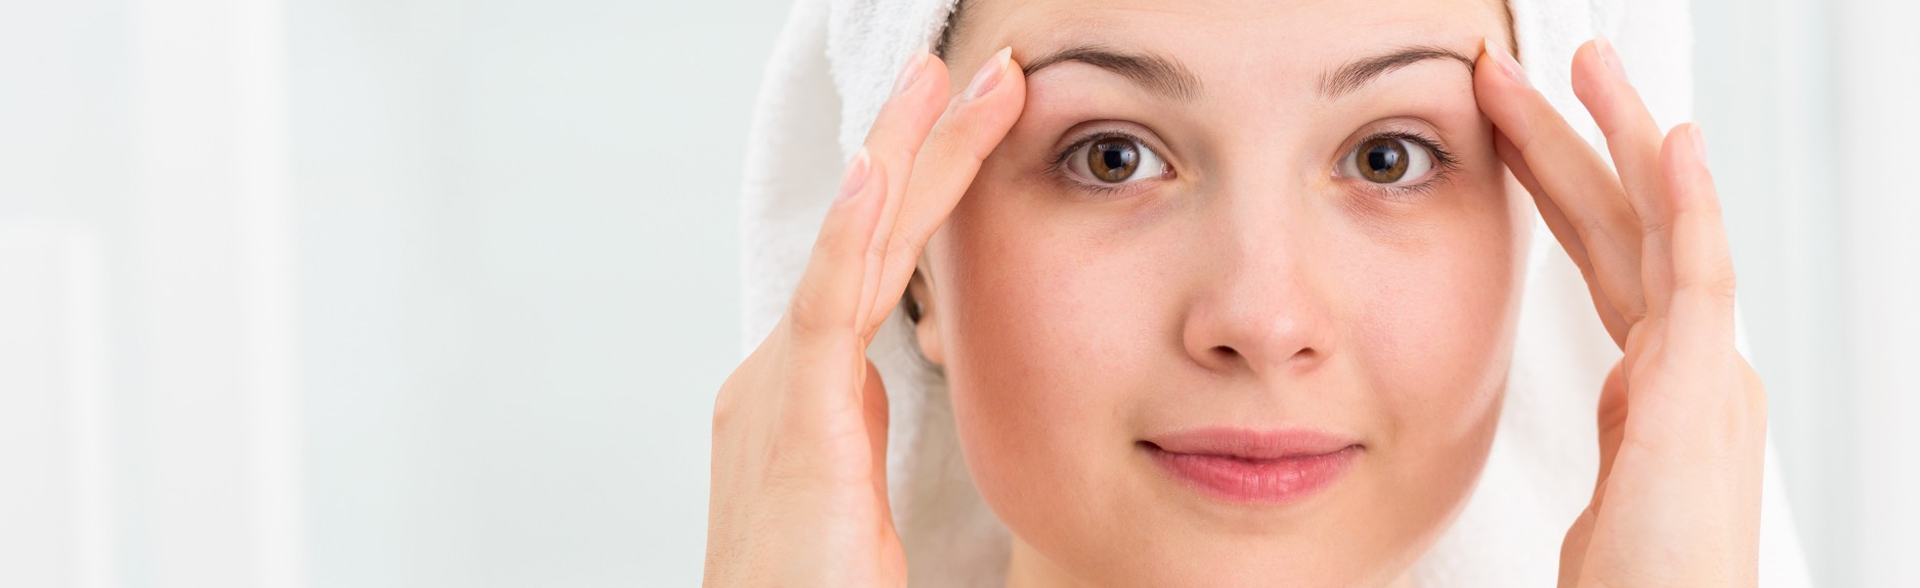 Treat aging skin